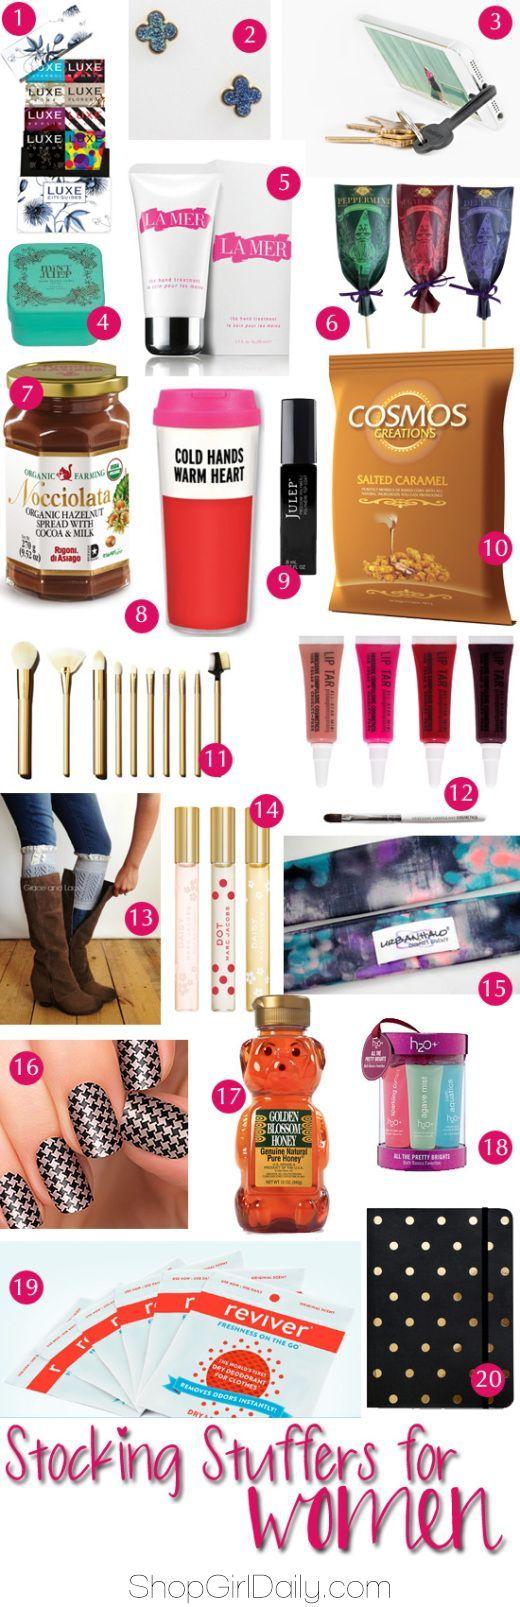 Stocking Stuffers for Women | http://ShopGirlDaily.com